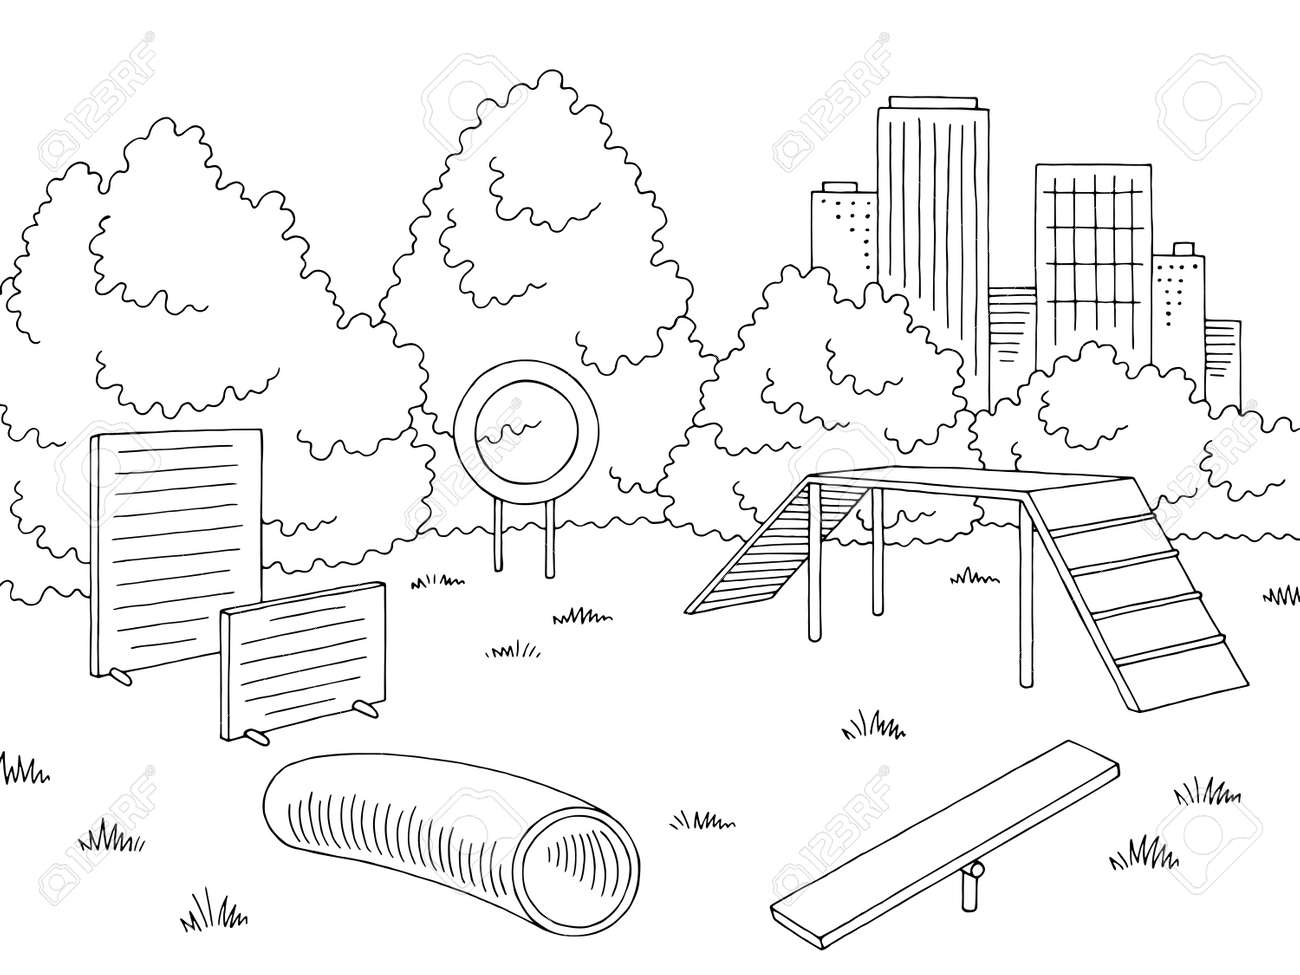 Children's playground graphic in black and white sketch. Vector illustration - 105393986